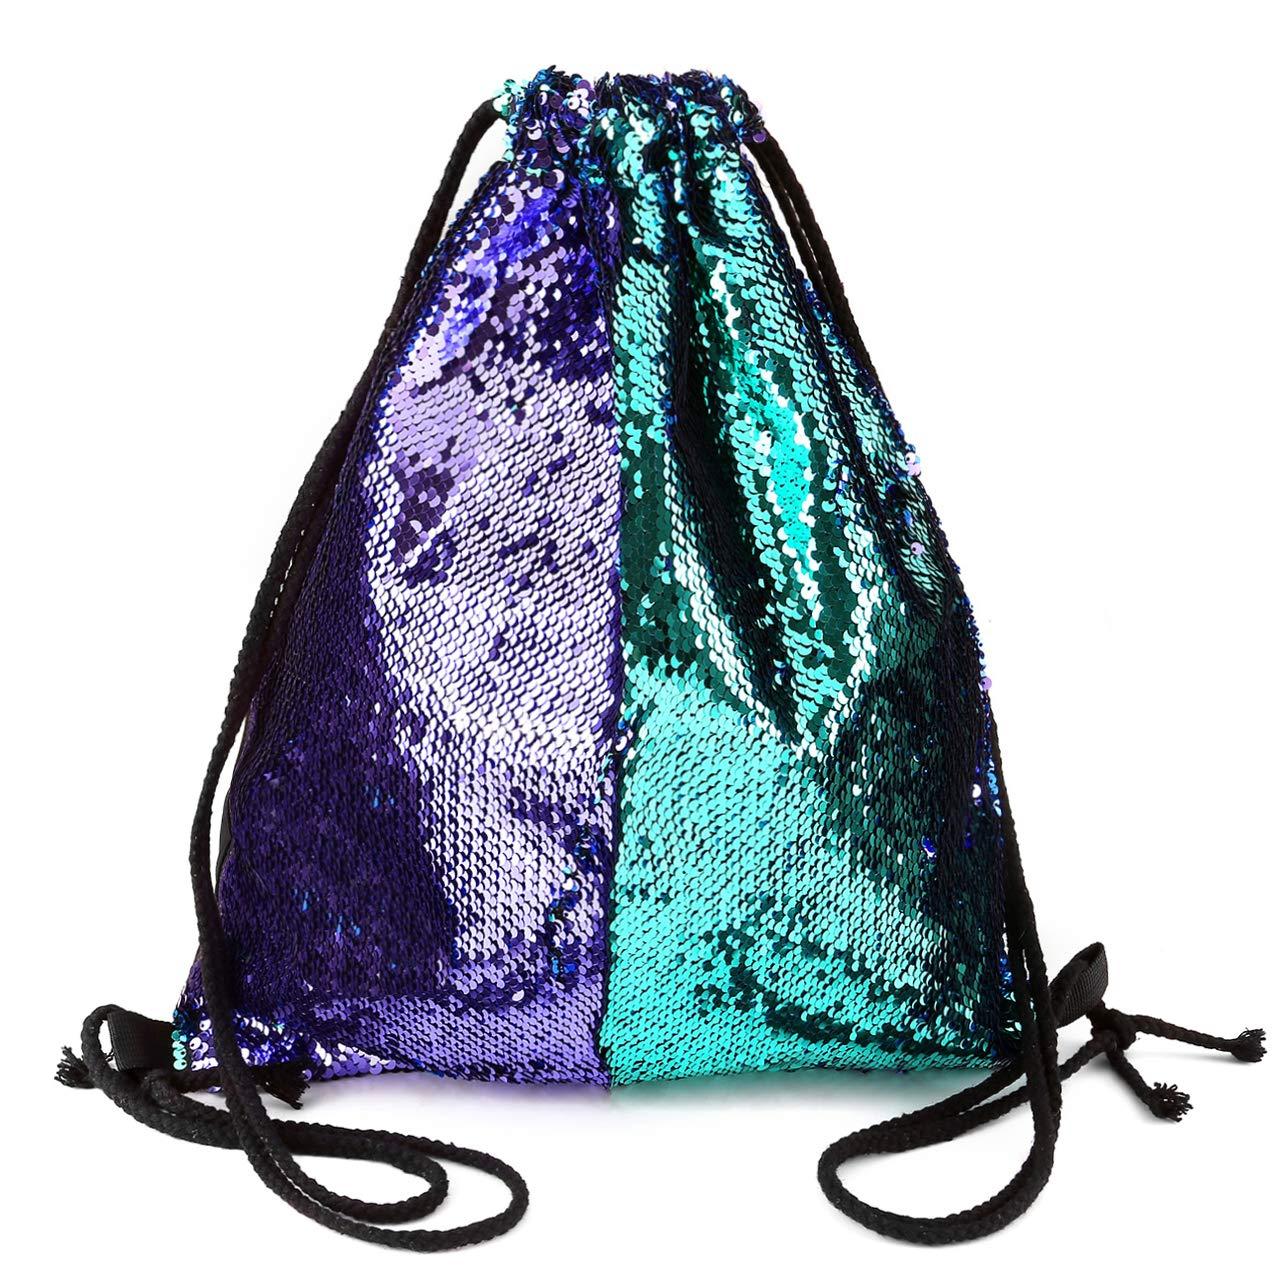 df3672cef7fe Ayliss Sequin Cinch Sack Drawstring Backpack Reversible Glitter Paillette  String Bag for Women/Men/Girls (Blue&Purple)